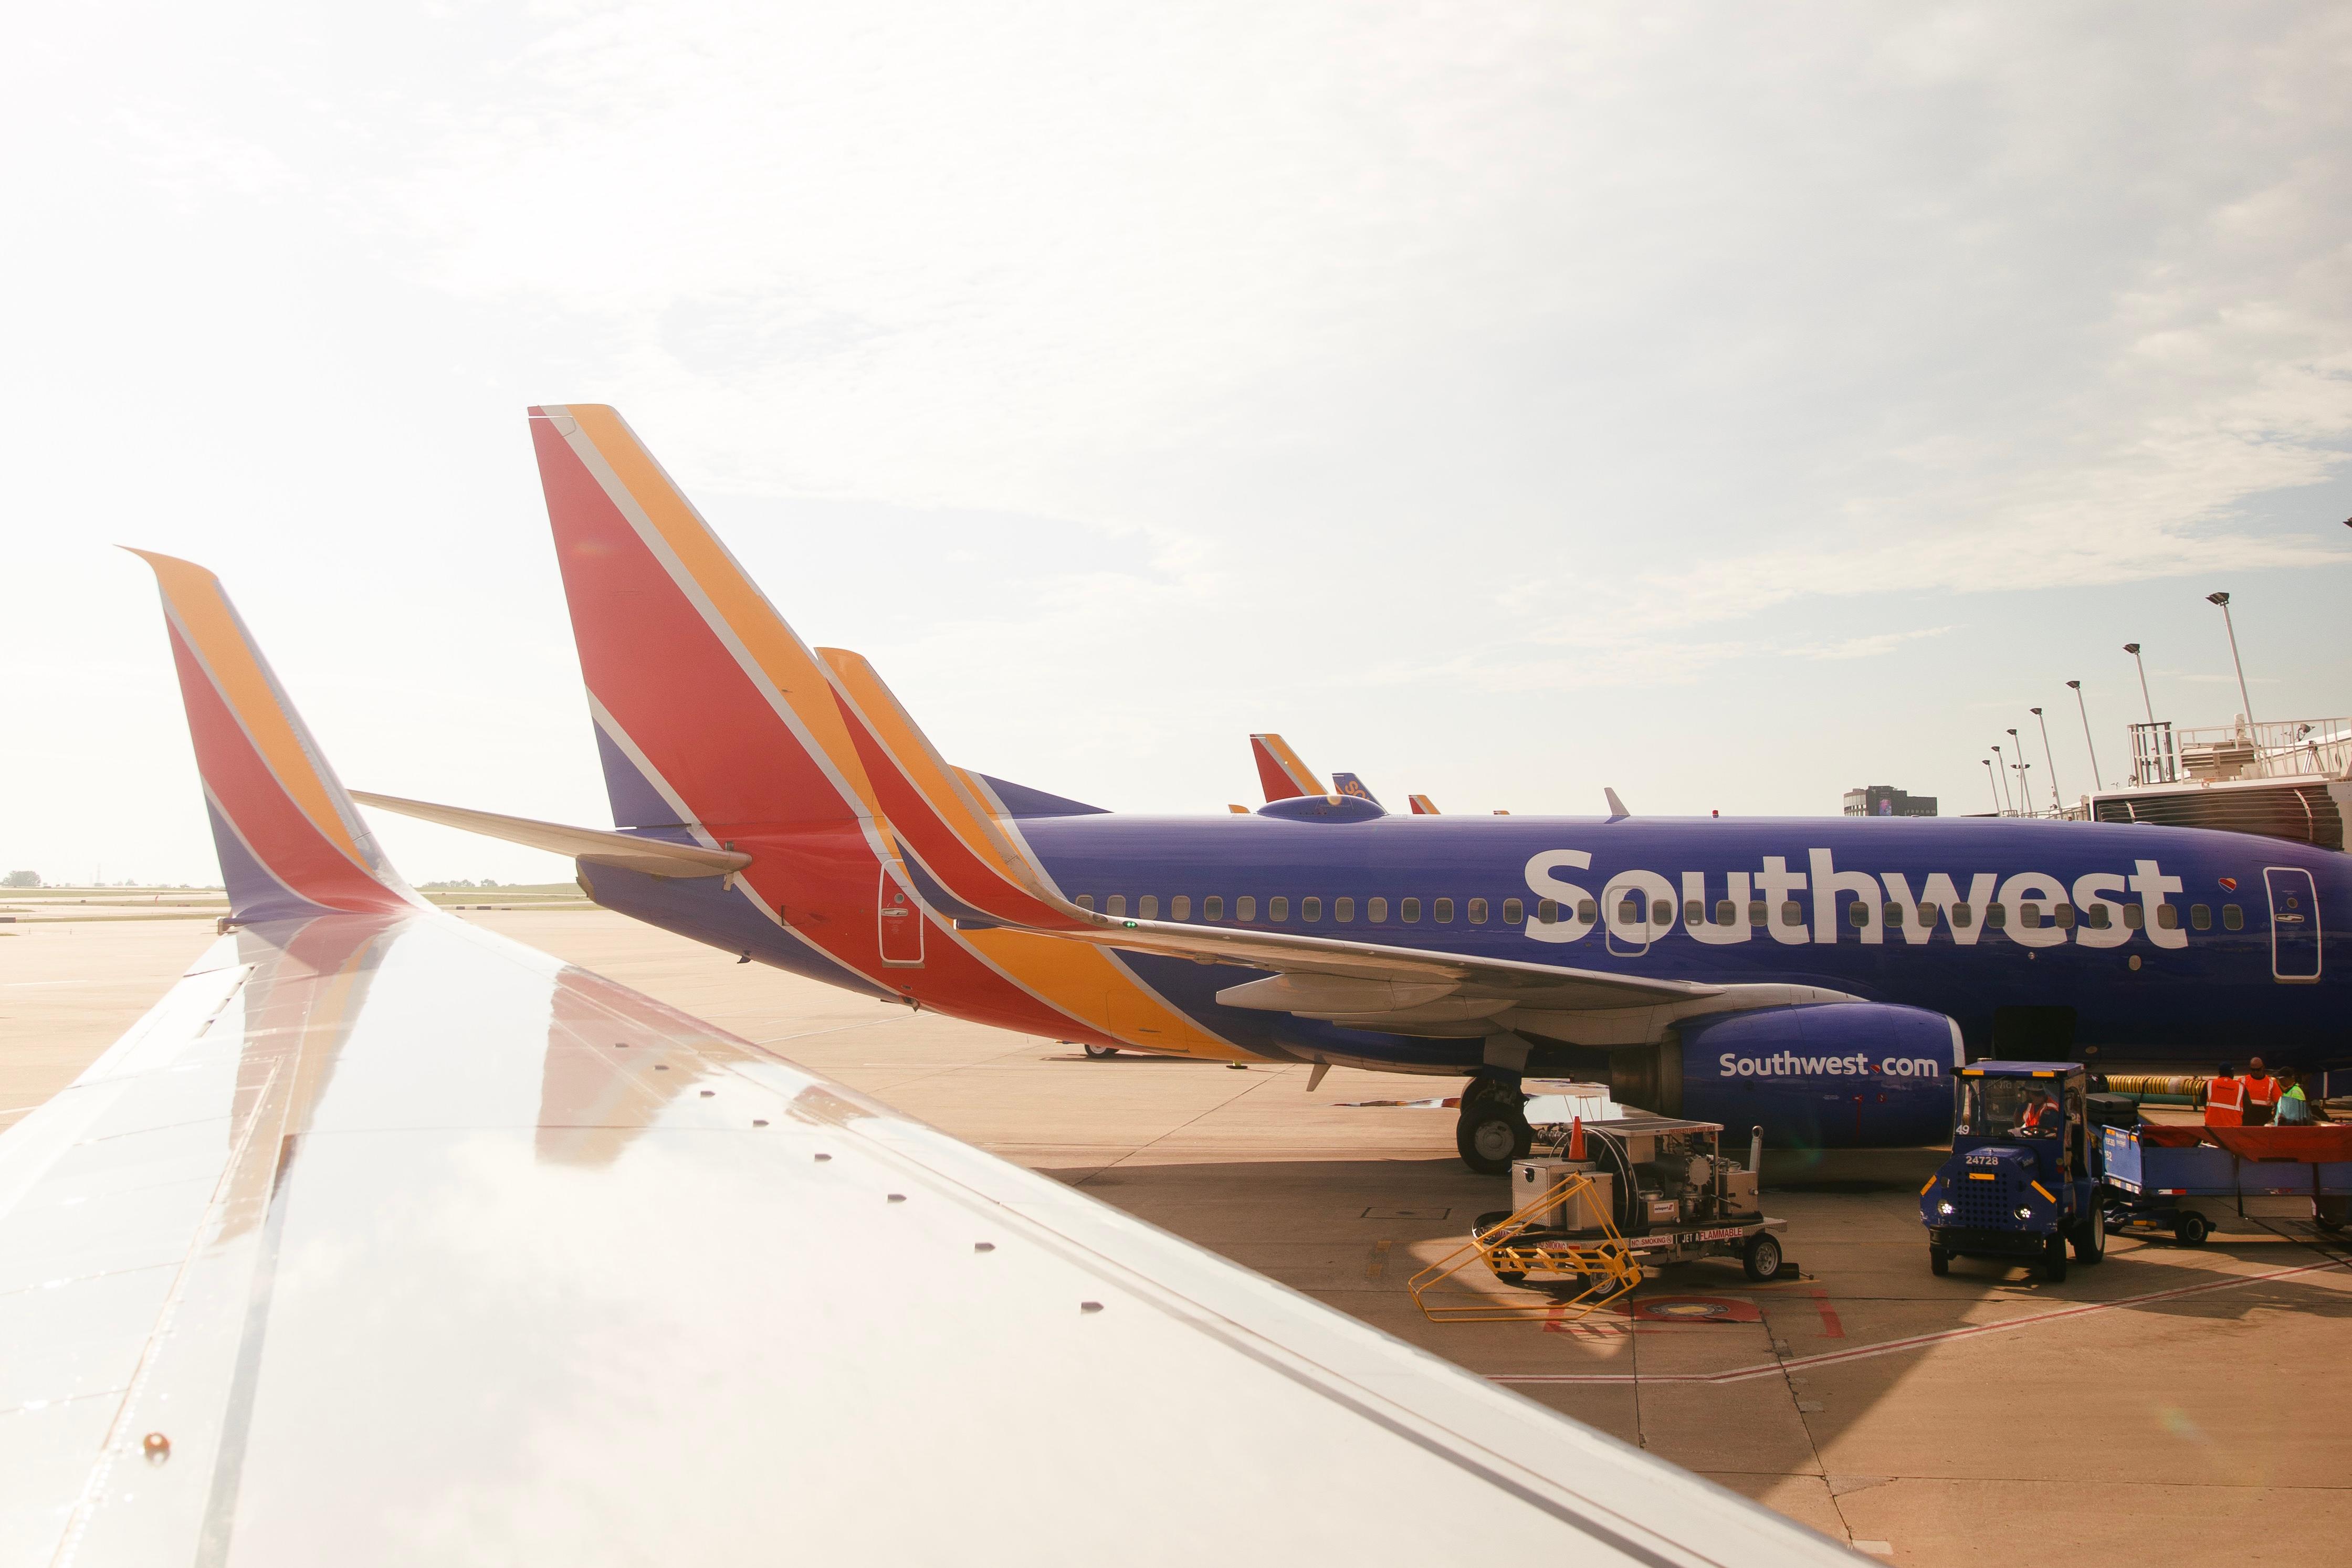 Southwest plane winglet